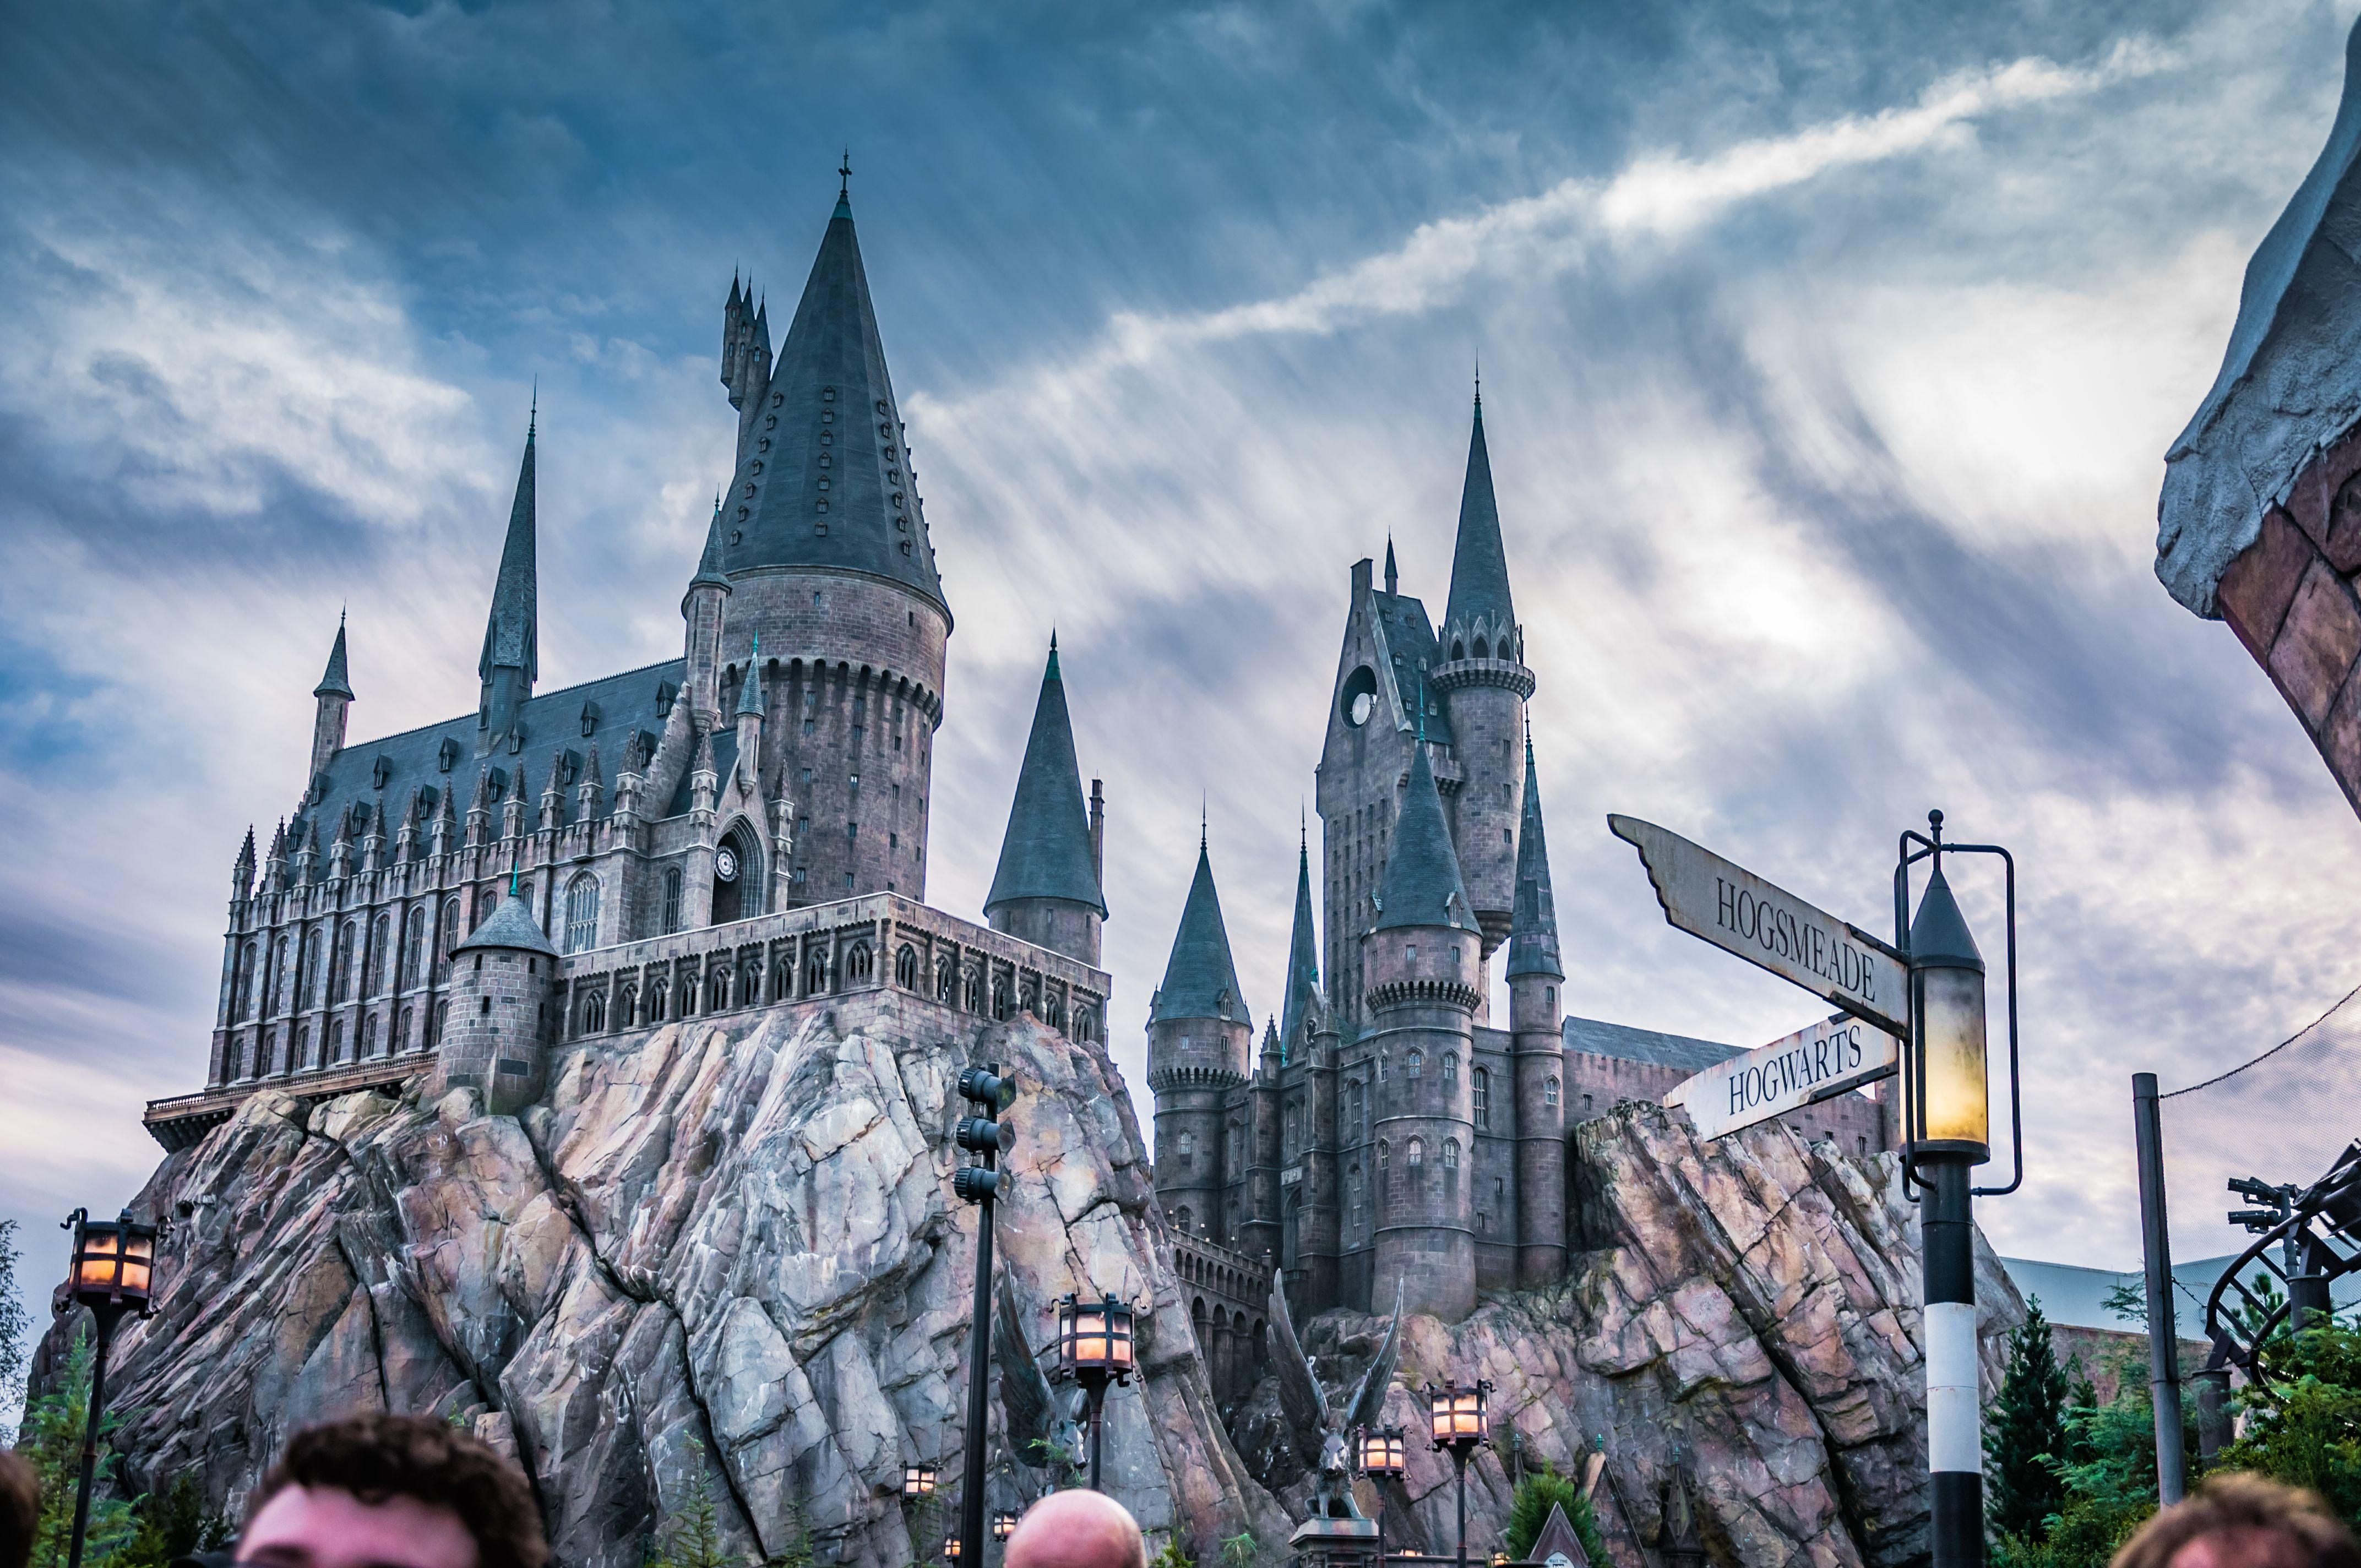 Universal Studios Florida Harry Potter Hogwarts Castle Harry Potter Hogwarts Castle Universal Studios Hogwarts Castle